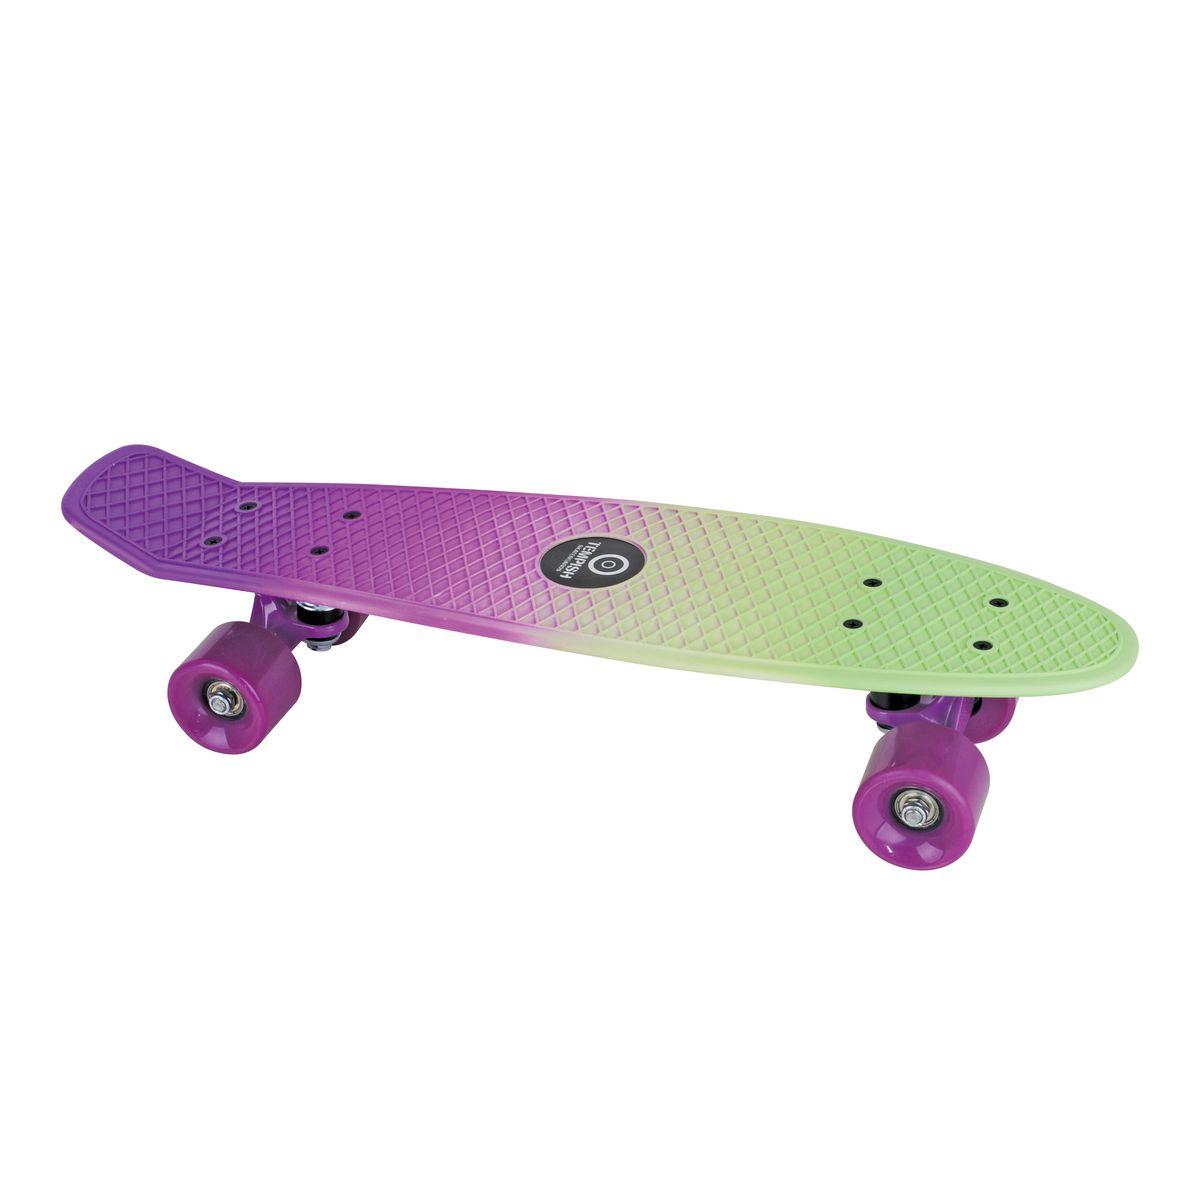 Скейтборд пластиковый Tempish Buffy Sweet, цвет: фиолетовый8592678058091Пени борд Tempish Buffy нагрузка до 100 кг